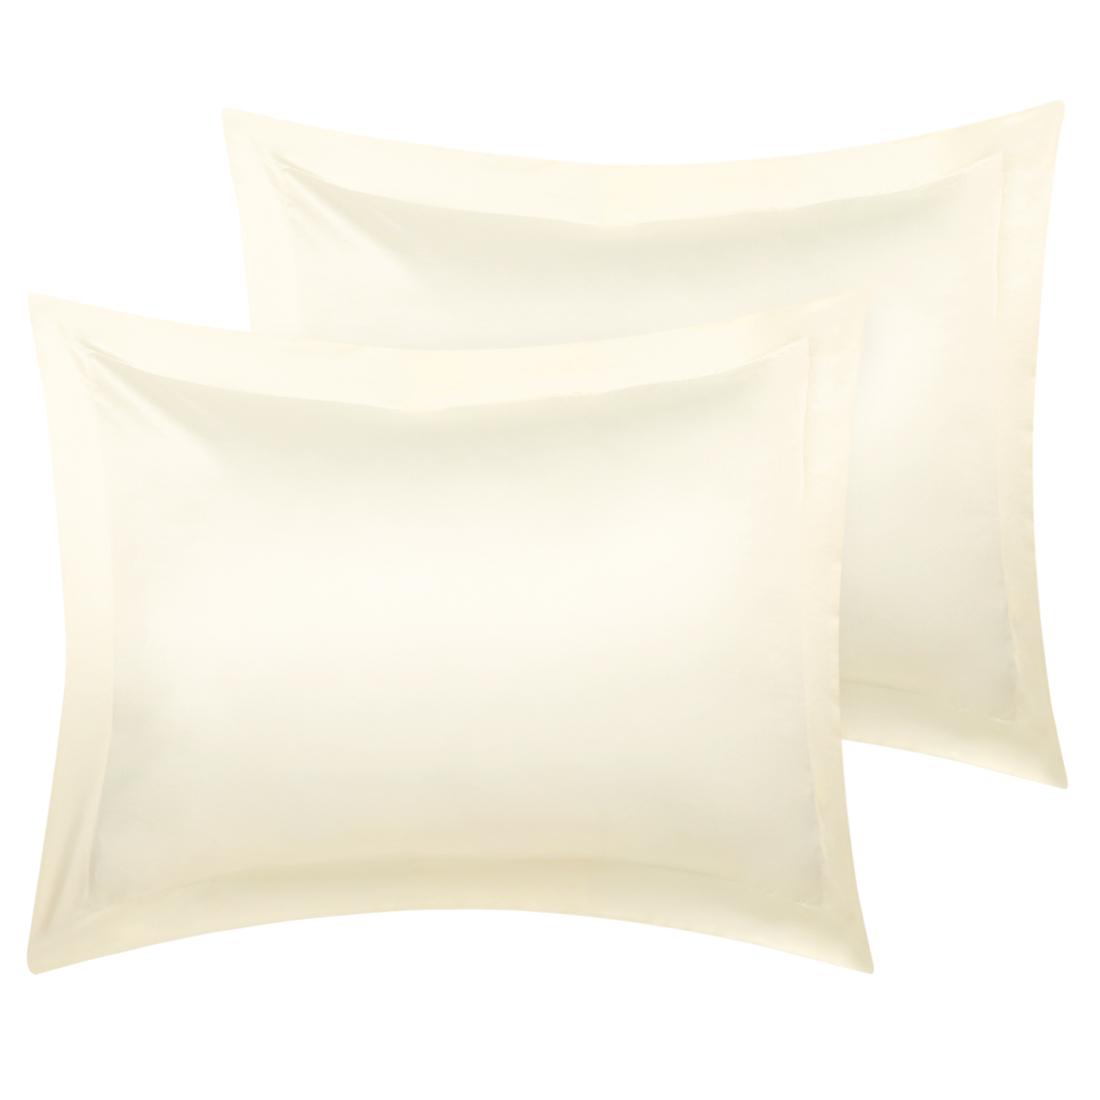 2 Pcs Cream Pillow Shams Satin Pillow Cases Standard Oxford Pillowcases